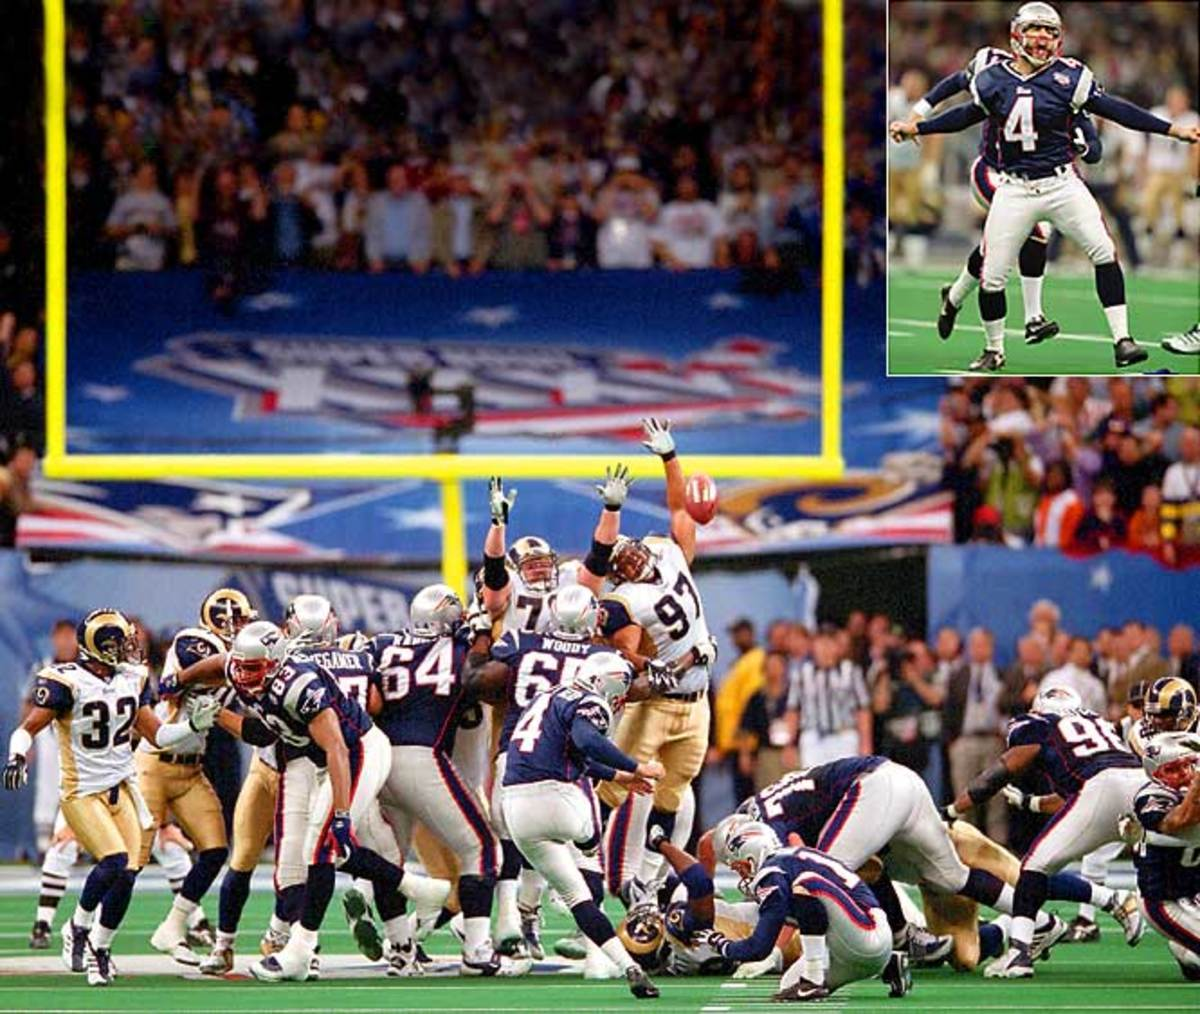 AdamVinatieri's Super Bowl-winning field goals